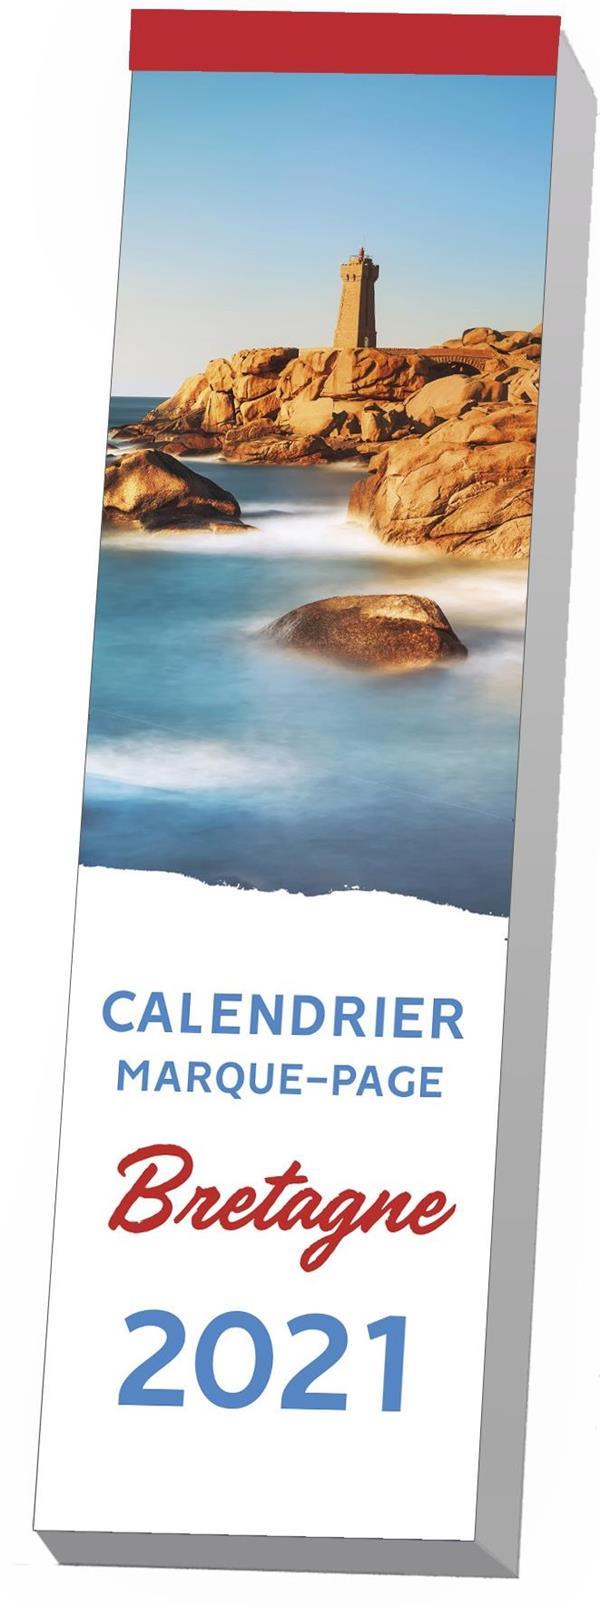 CALENDRIER MARQUE-PAGE  -  BRETAGNE (EDITION 2021) EDITIONS 365 NC